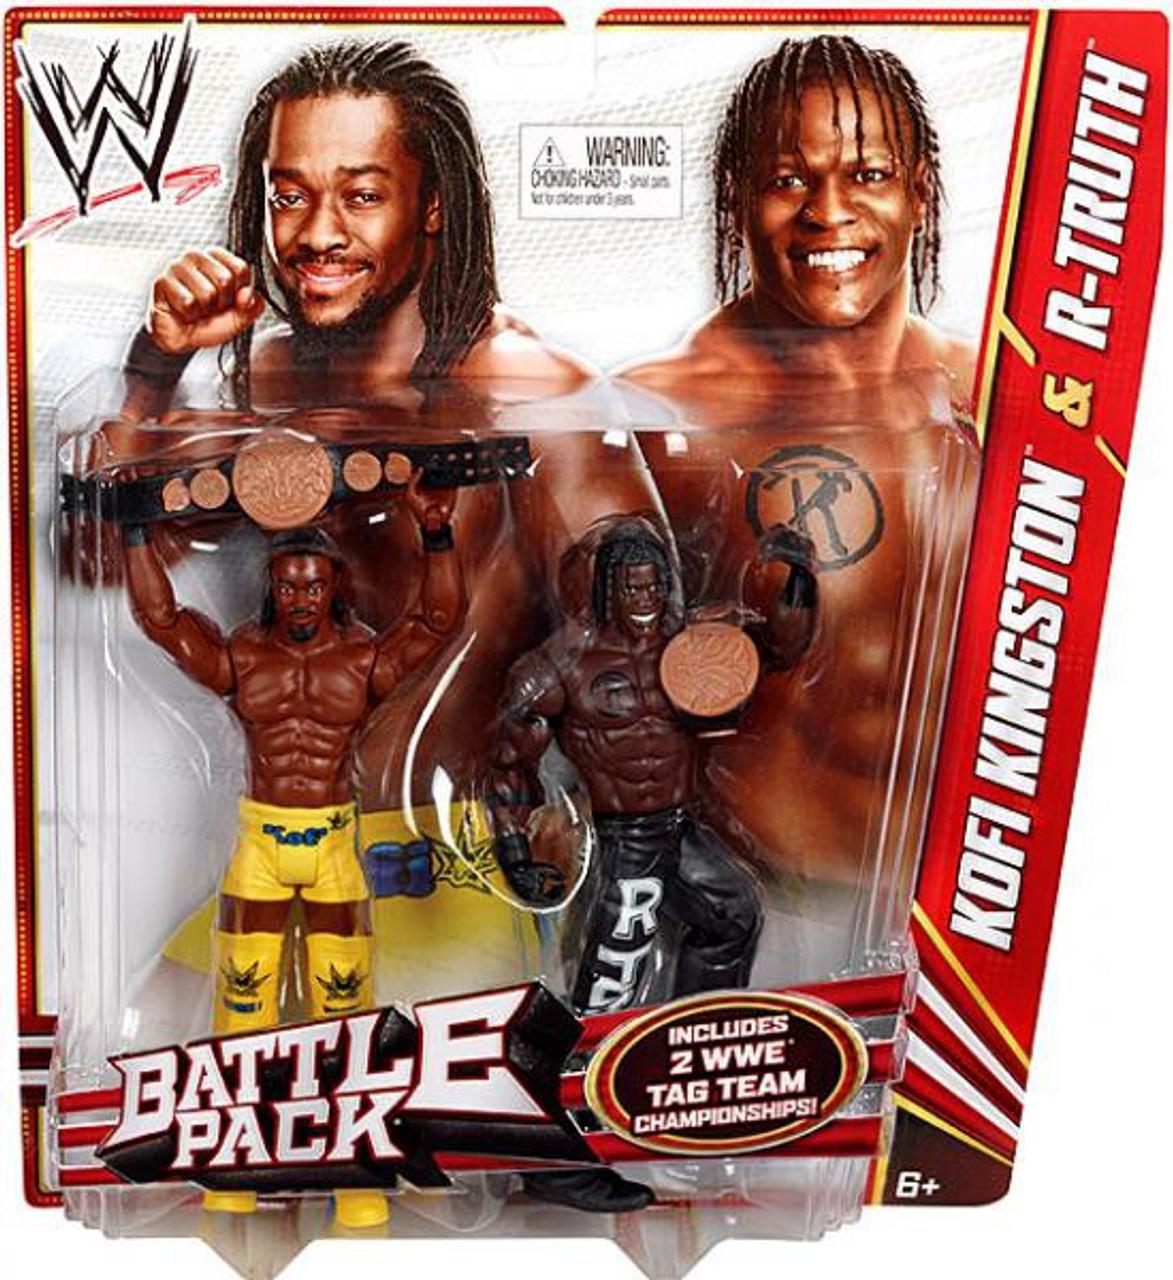 WWE Wrestling Series 20 Kofi Kingston & R-Truth Action Figure 2-Pack [2 WWE Tag Team Championships]